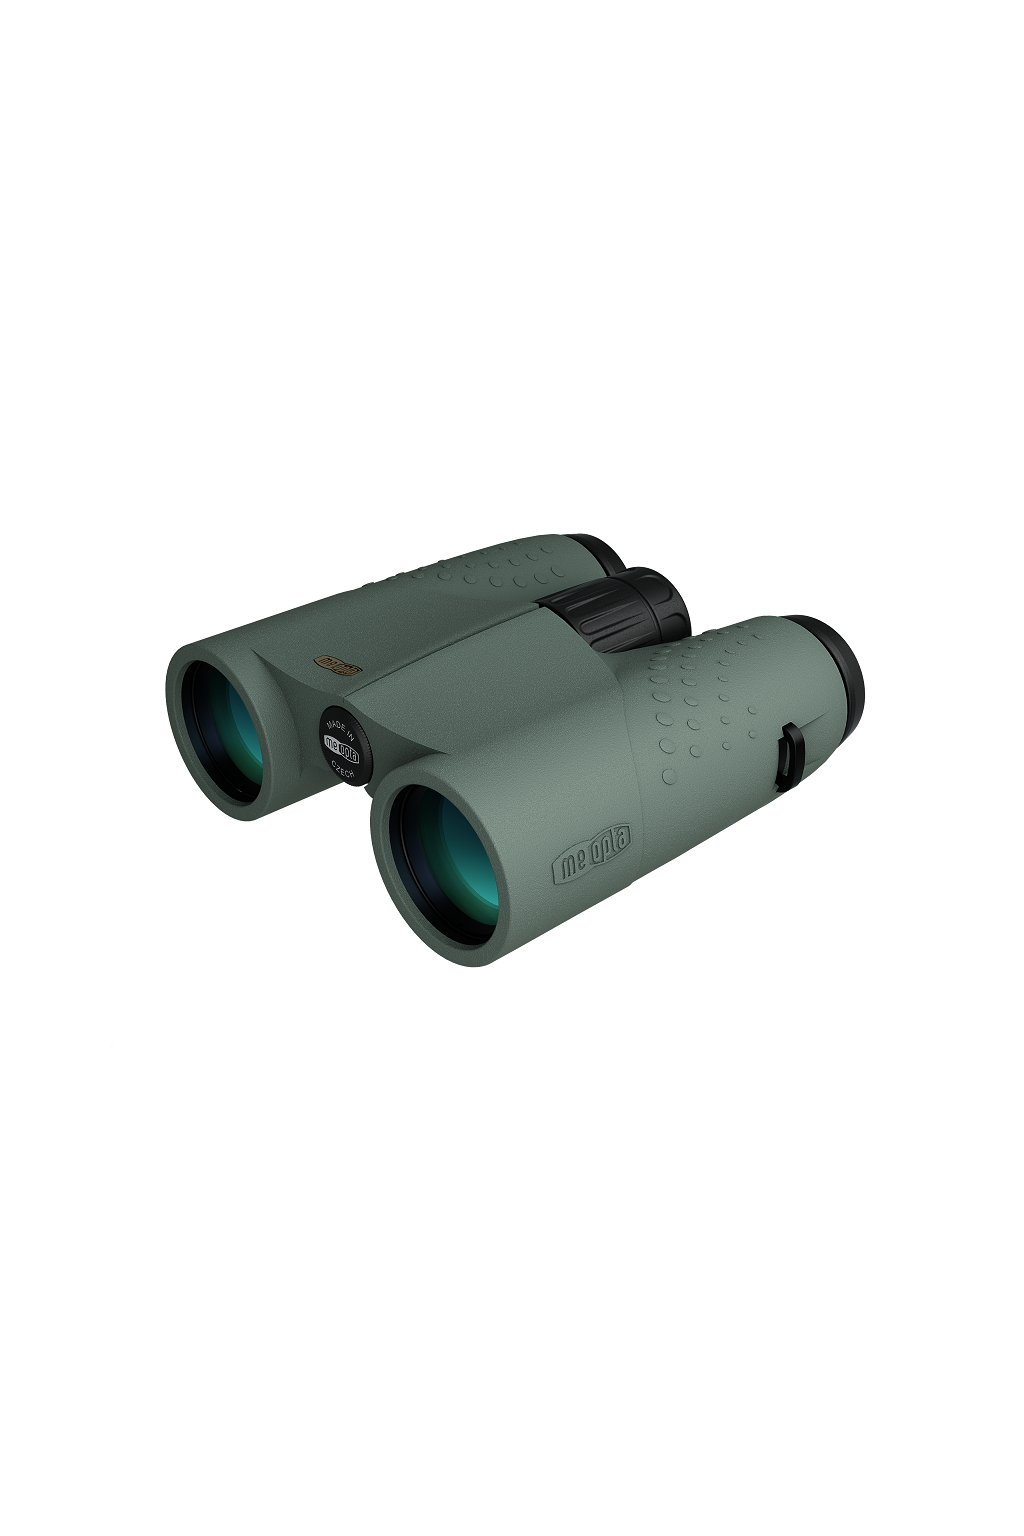 BinocularB1 8x32 1